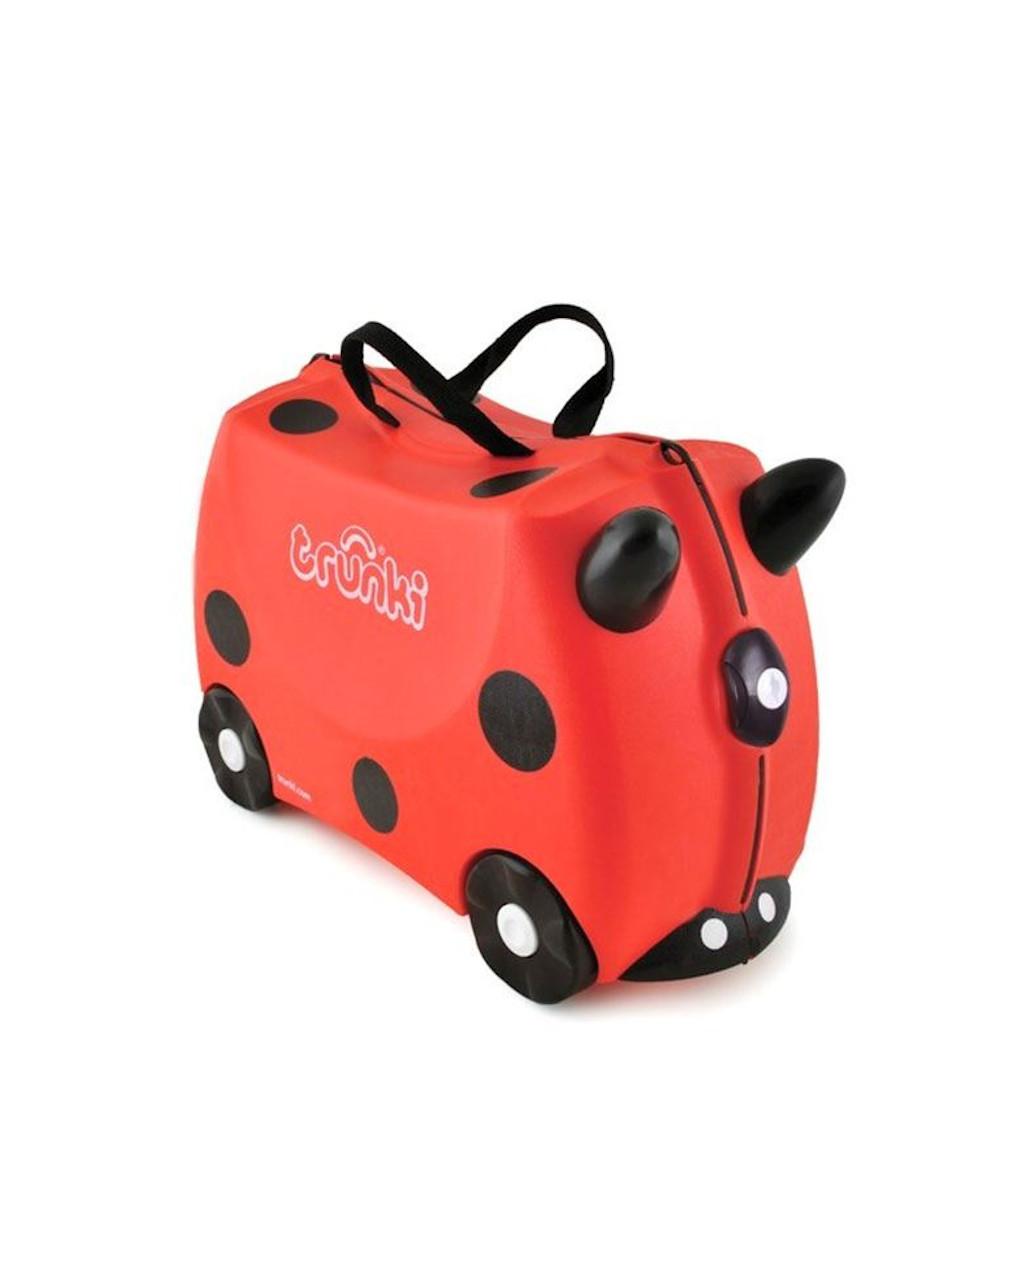 Trunki valigia cavalcabile coccinella - Trunki